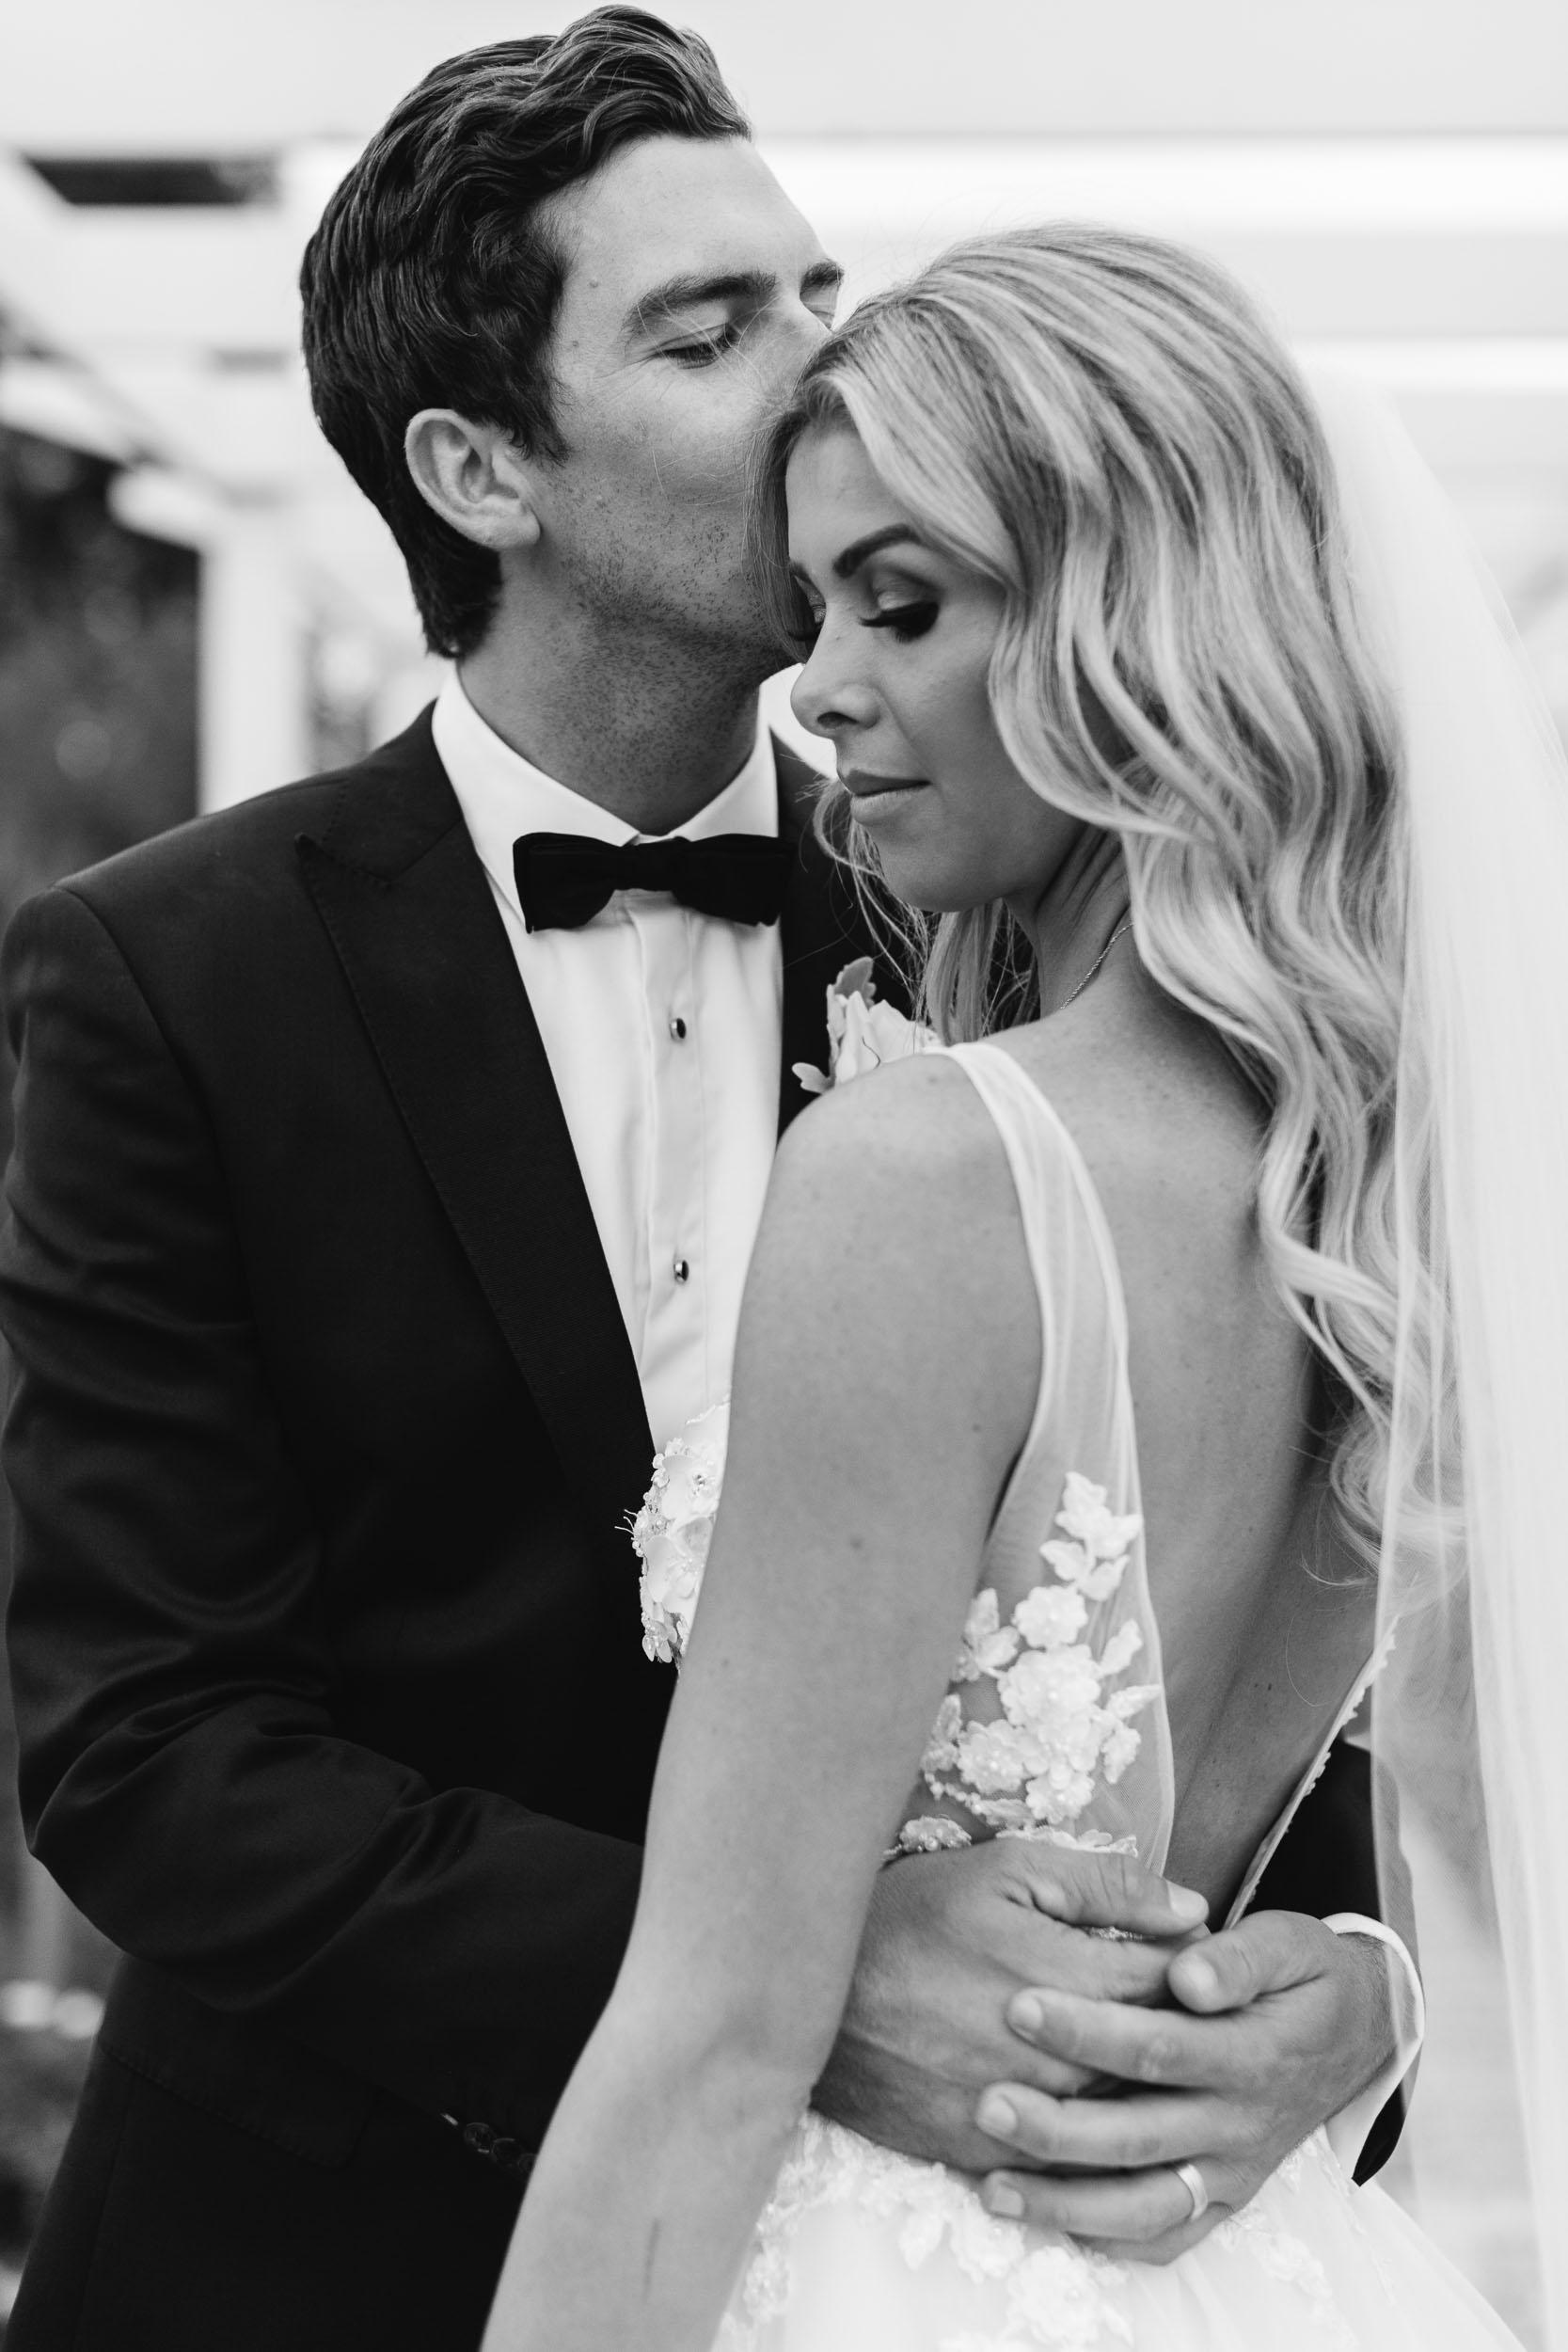 Kas-Richards-Mornington-Peninsula-Private-Property-Wedding-Marianna-Hardwick-Gown-518.jpg